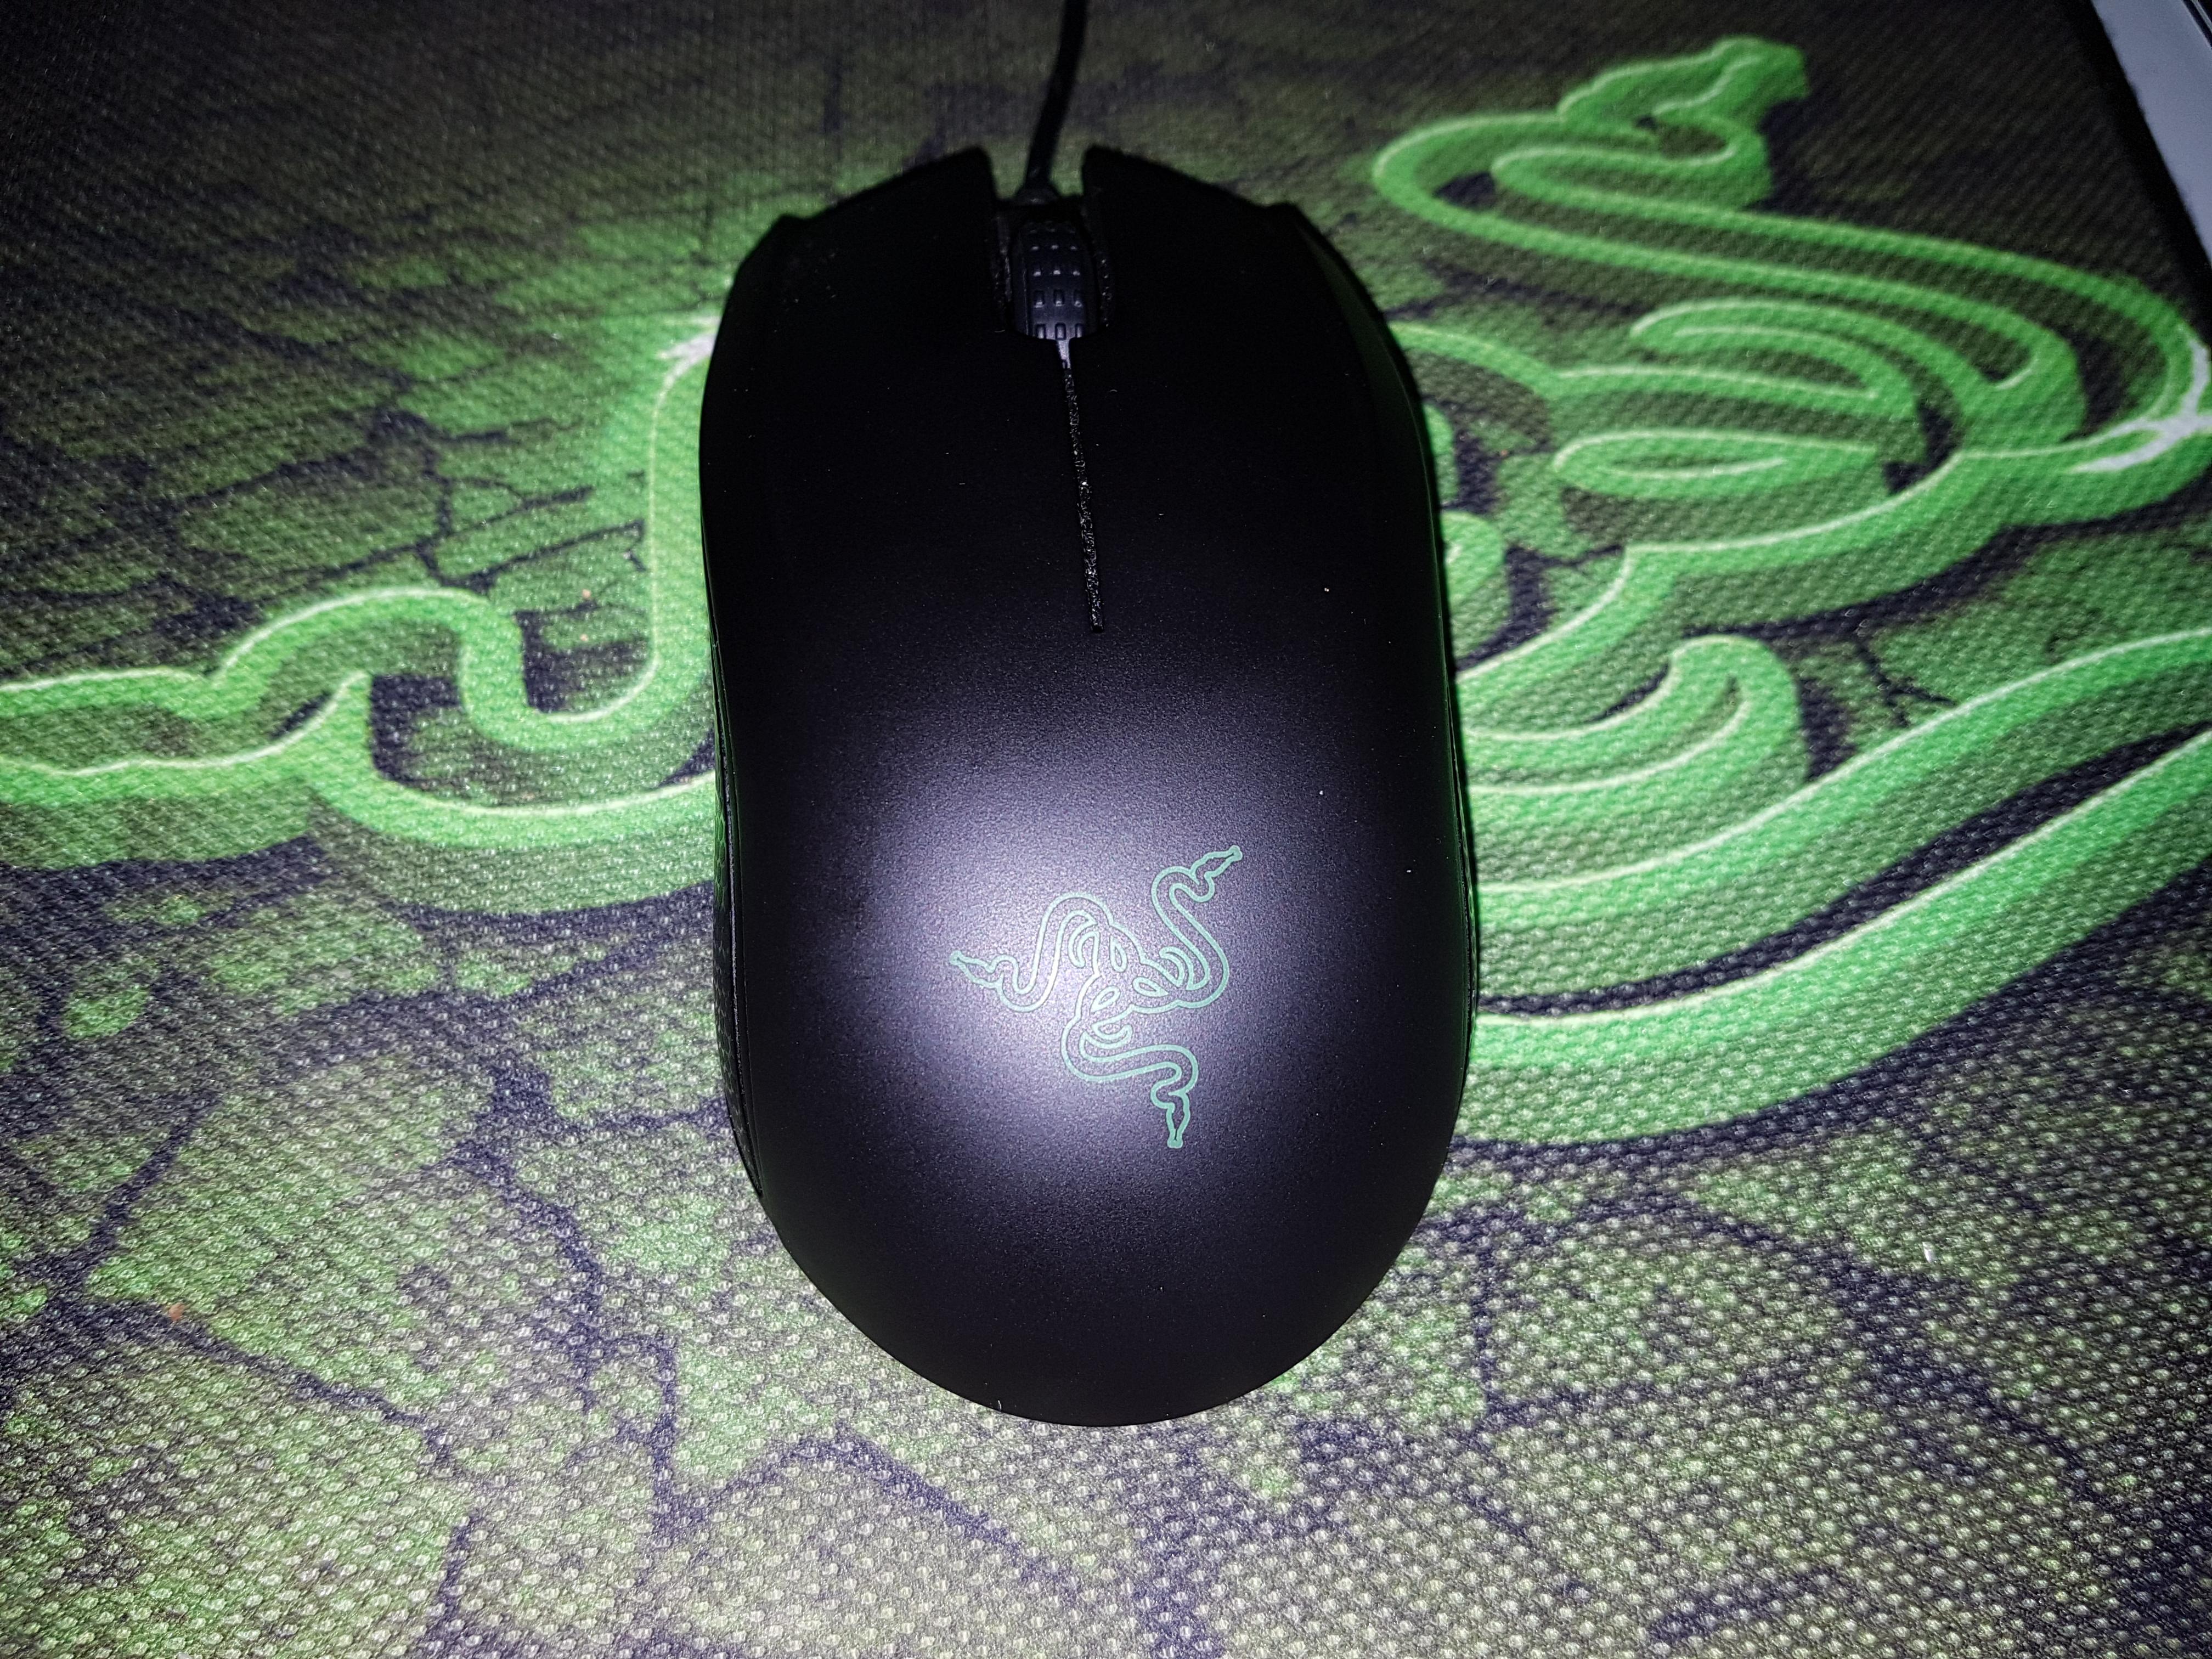 Gaming Mouse Jpeg